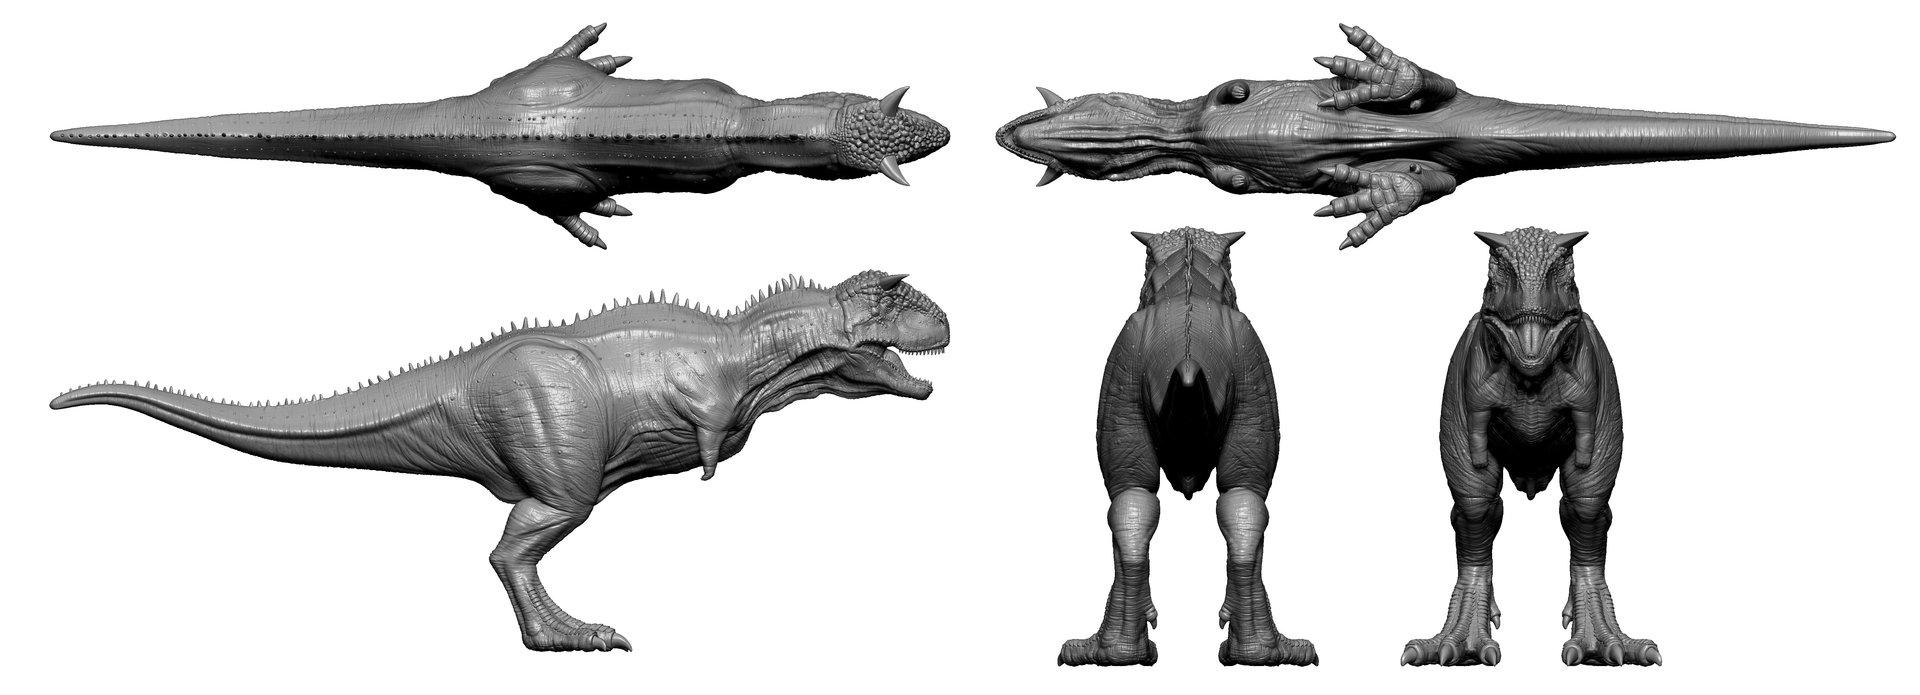 Jesse sandifer carnotaurus3